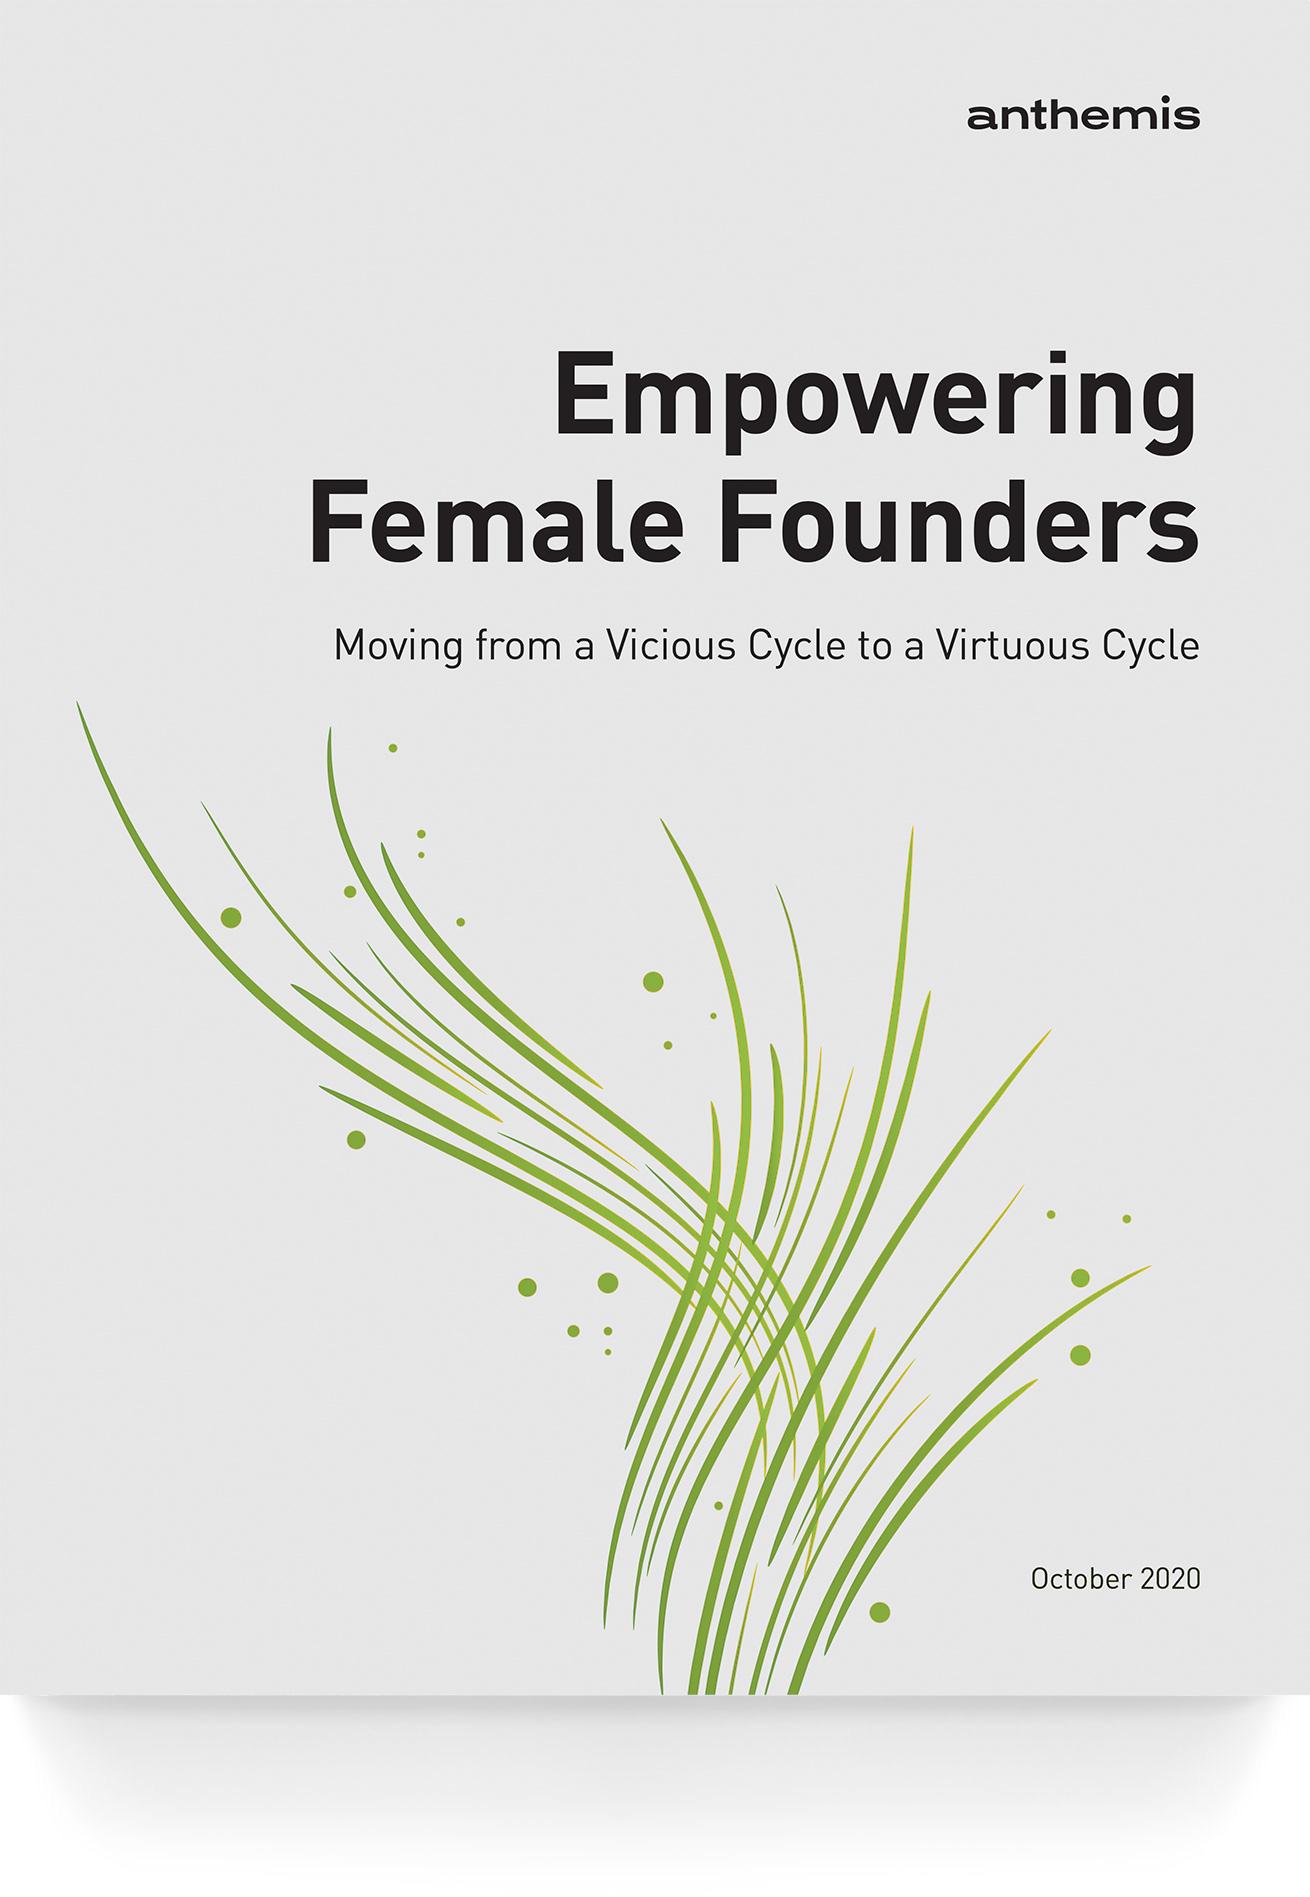 Anthemis - Empowering Female Founders (Whitepaper)